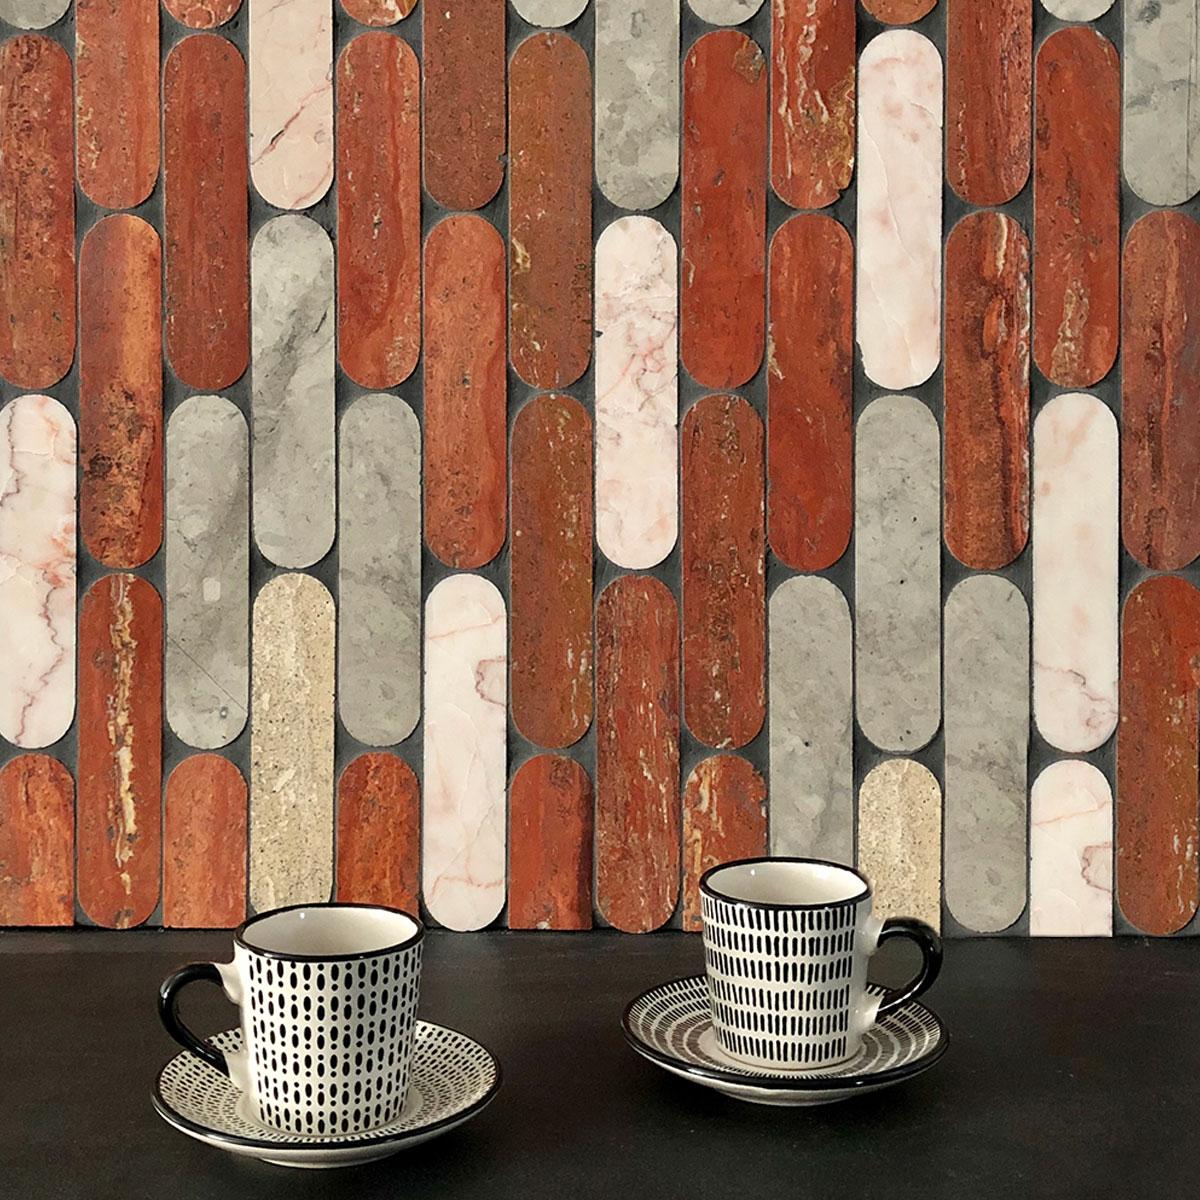 Tictax - Rosa, Tunis Grey, Roman Trav, Rosado, Honed - Mosaic and Feature Tiles - Stone3 Brisbane